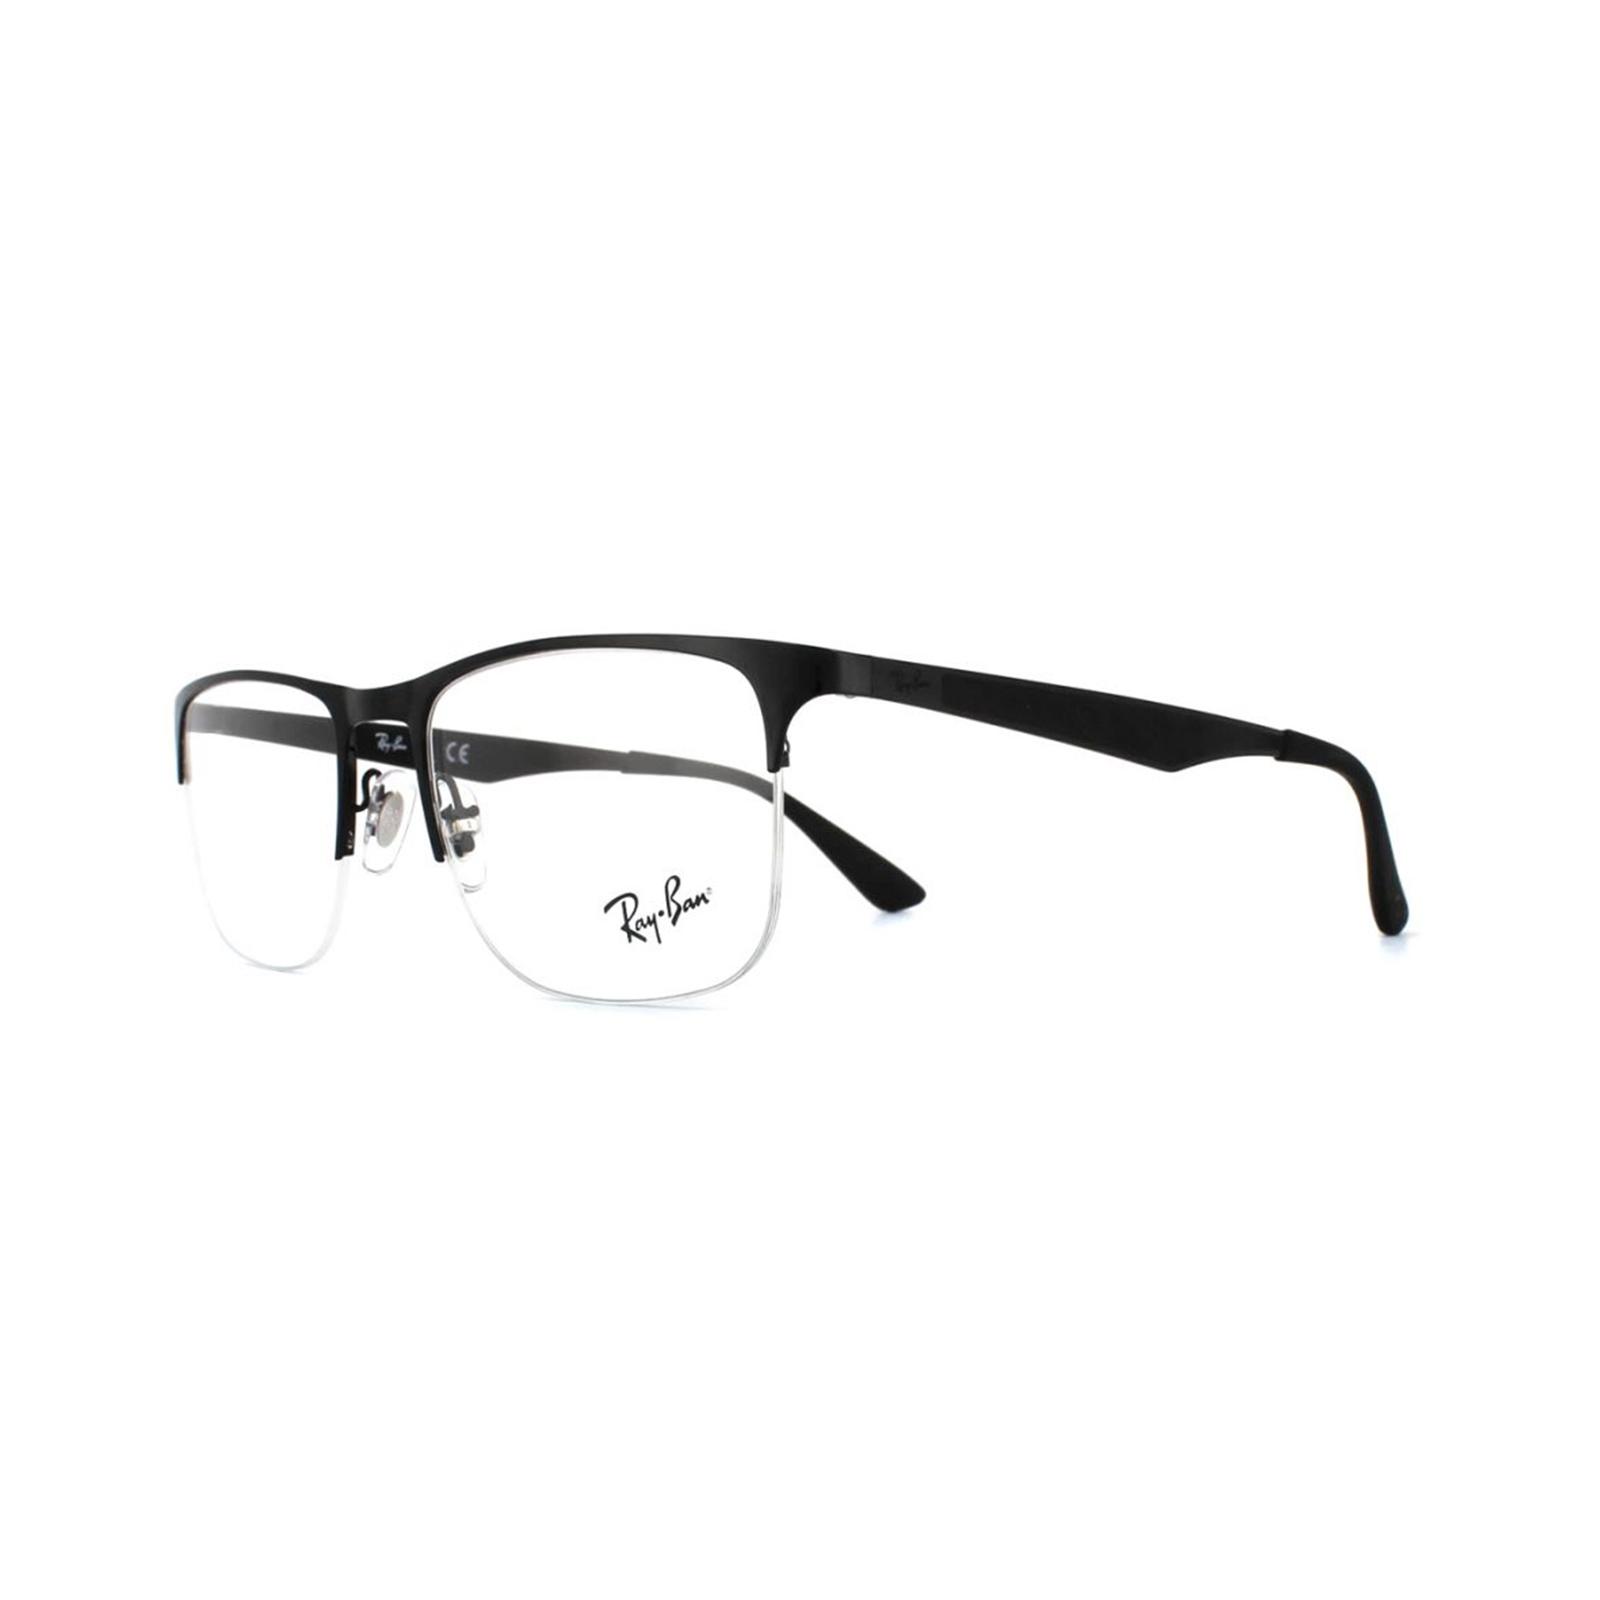 5ed5925632c Sentinel Ray-Ban Glasses Frames RX 6362 2509 Shiny Black Mens 53mm